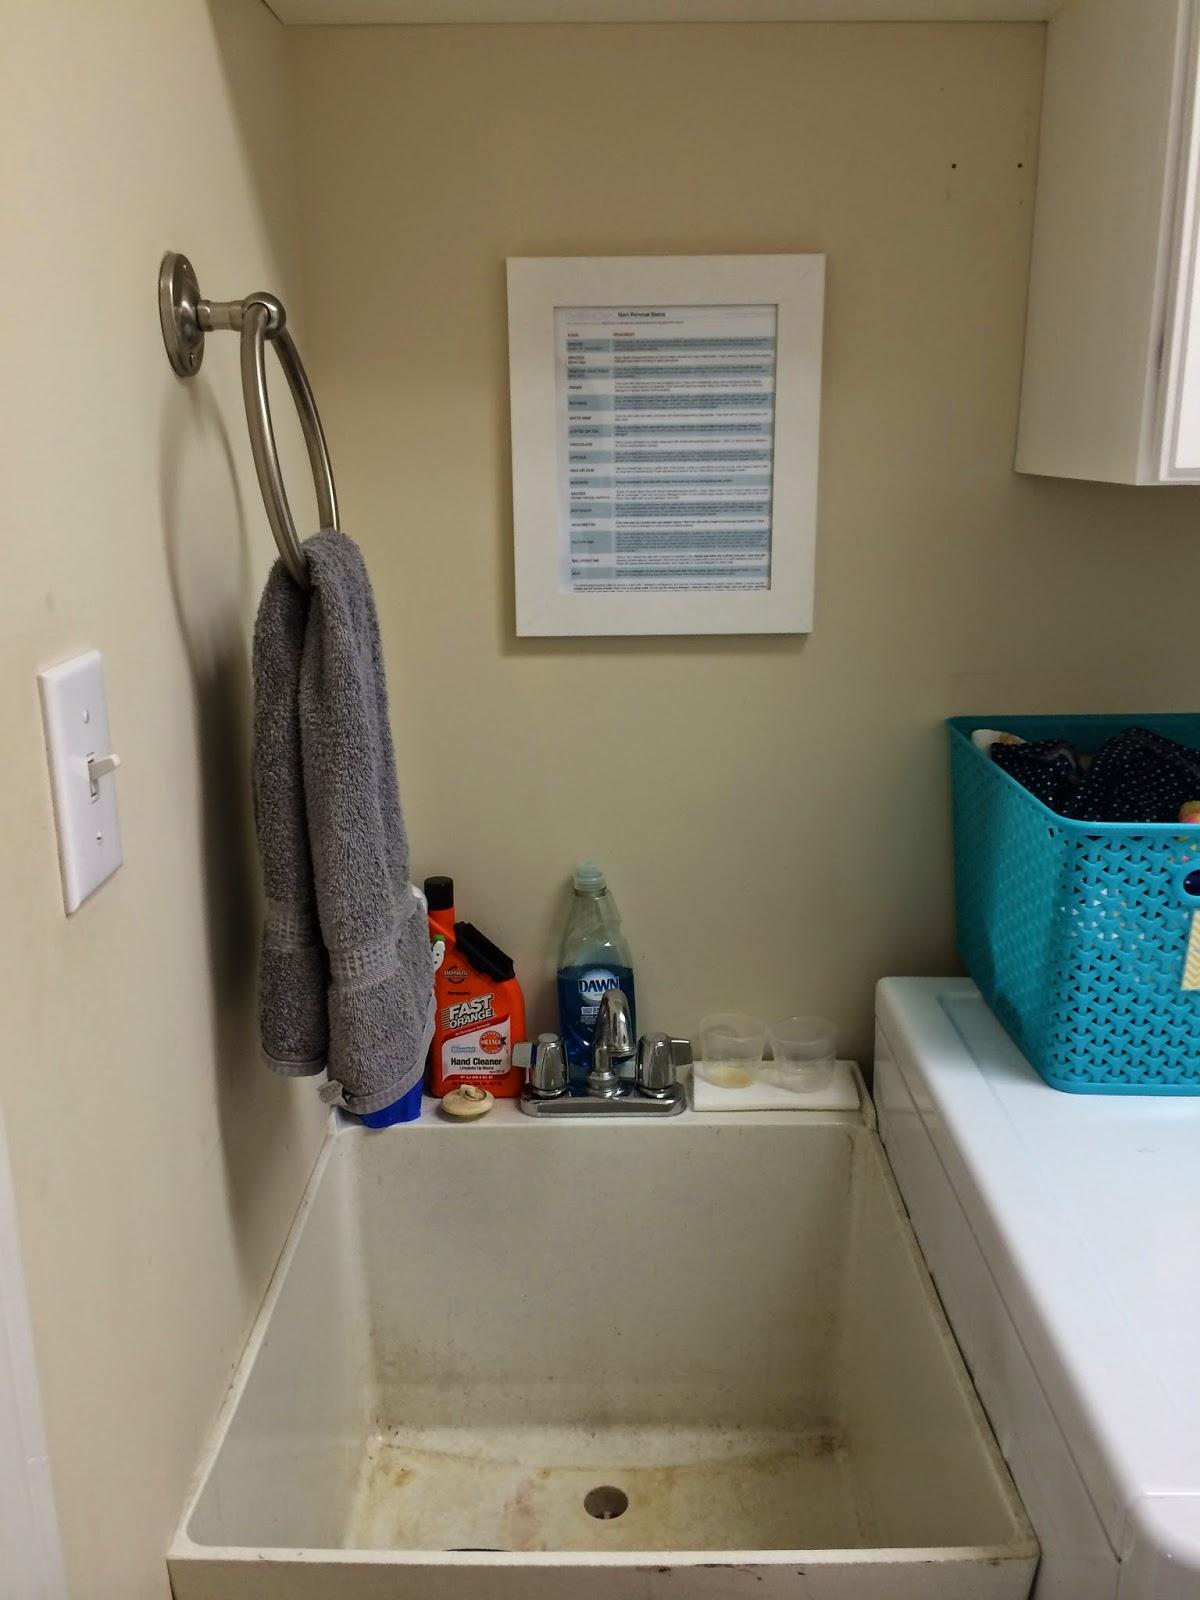 Martha Stewart Laundry Cabinet Upside Of Chaos The Laundry Room Organized